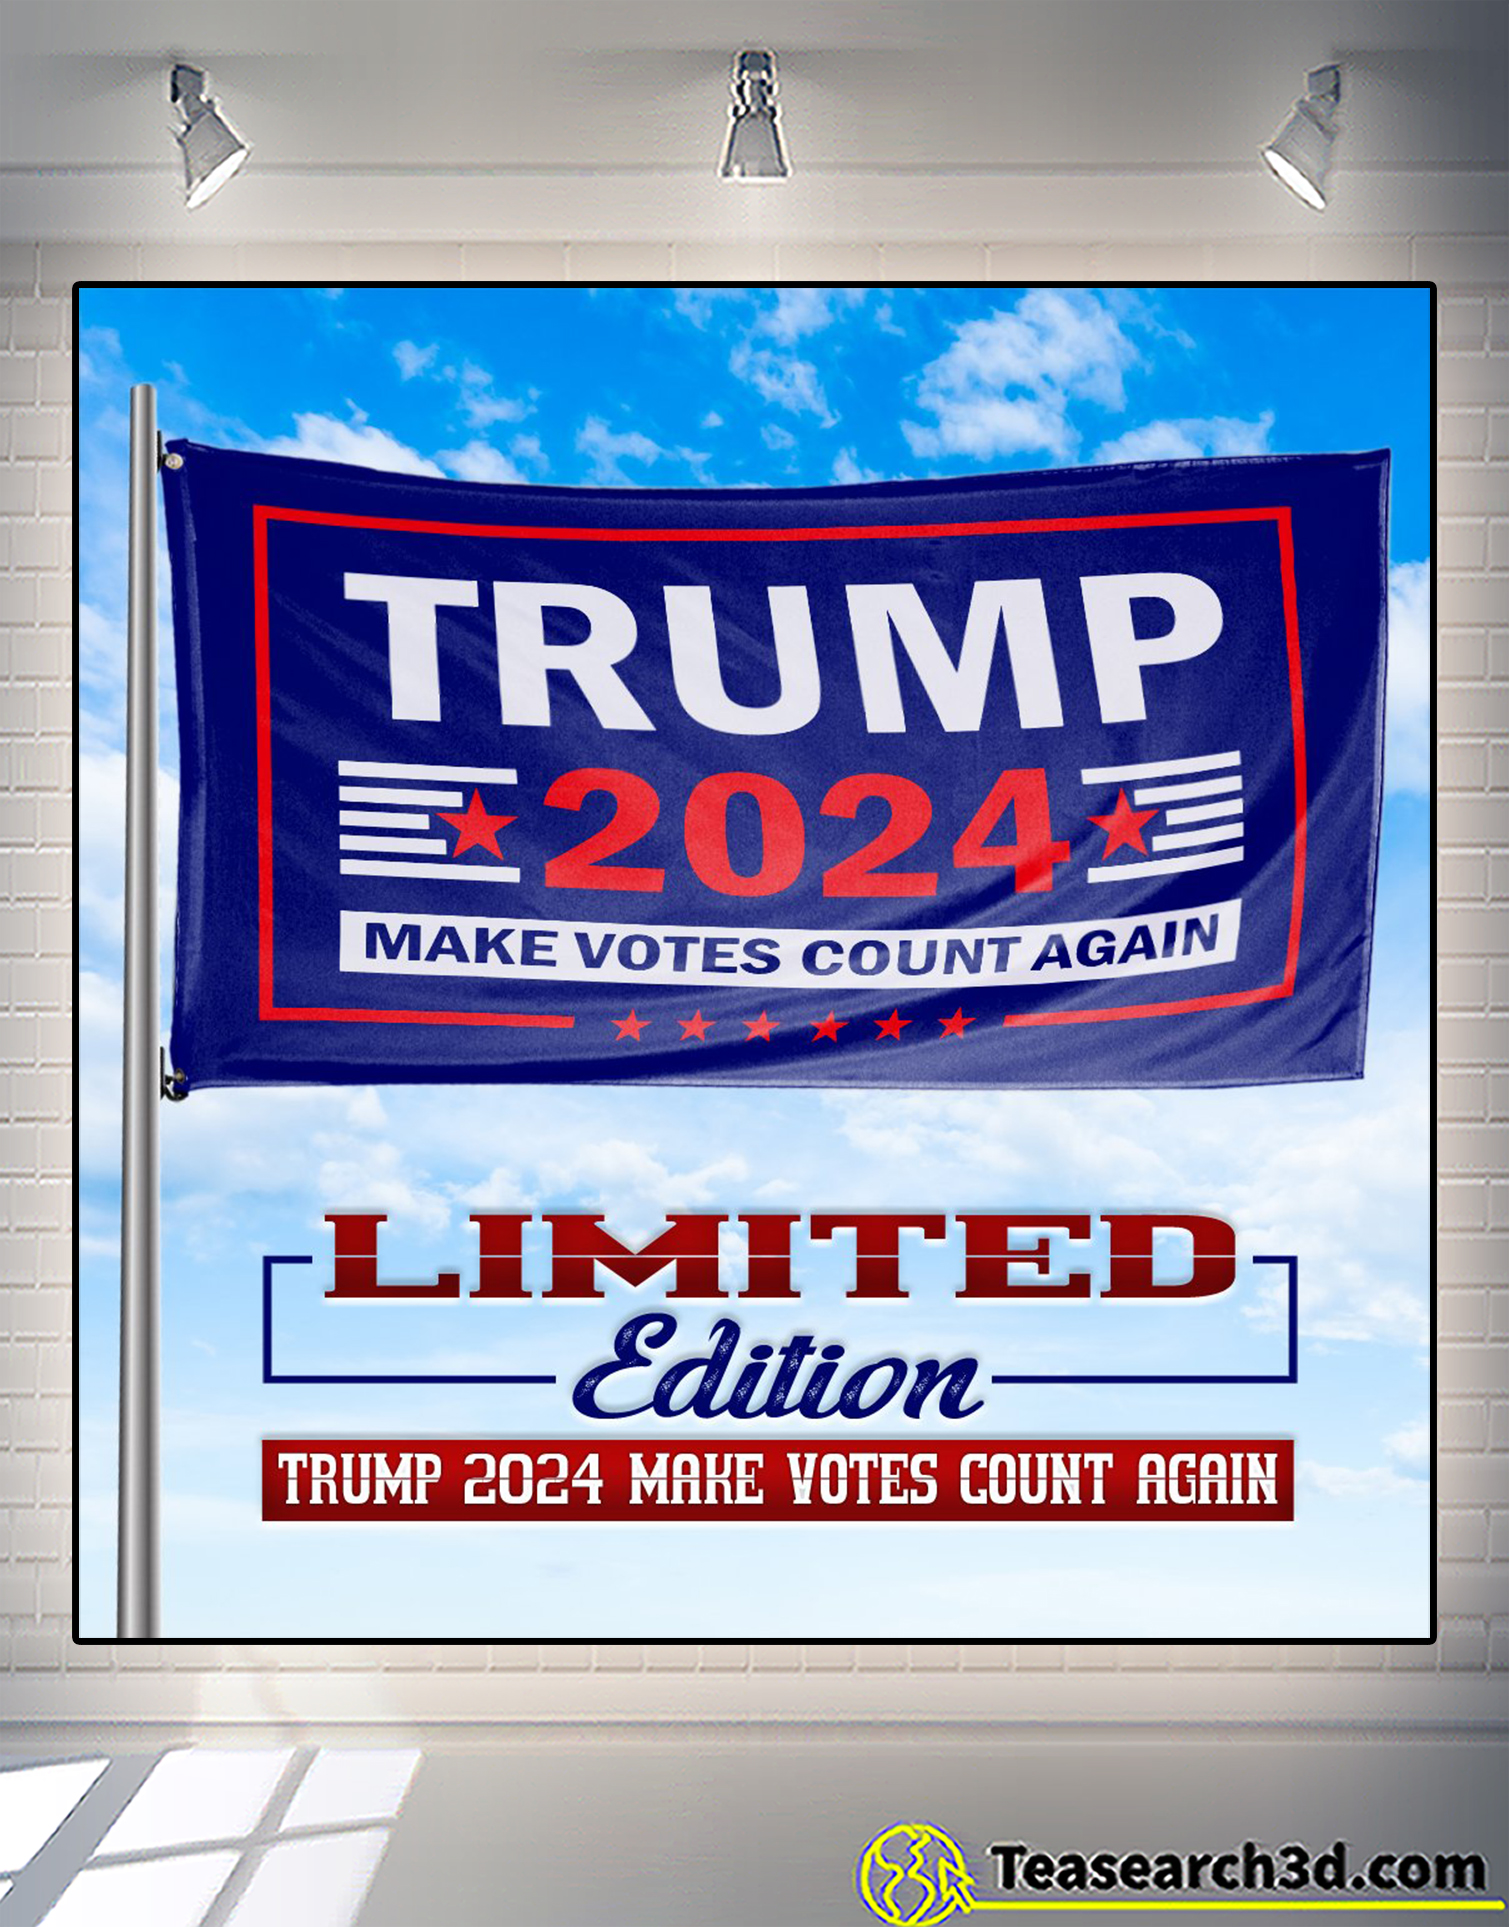 Trump 2024 make votes count again flag